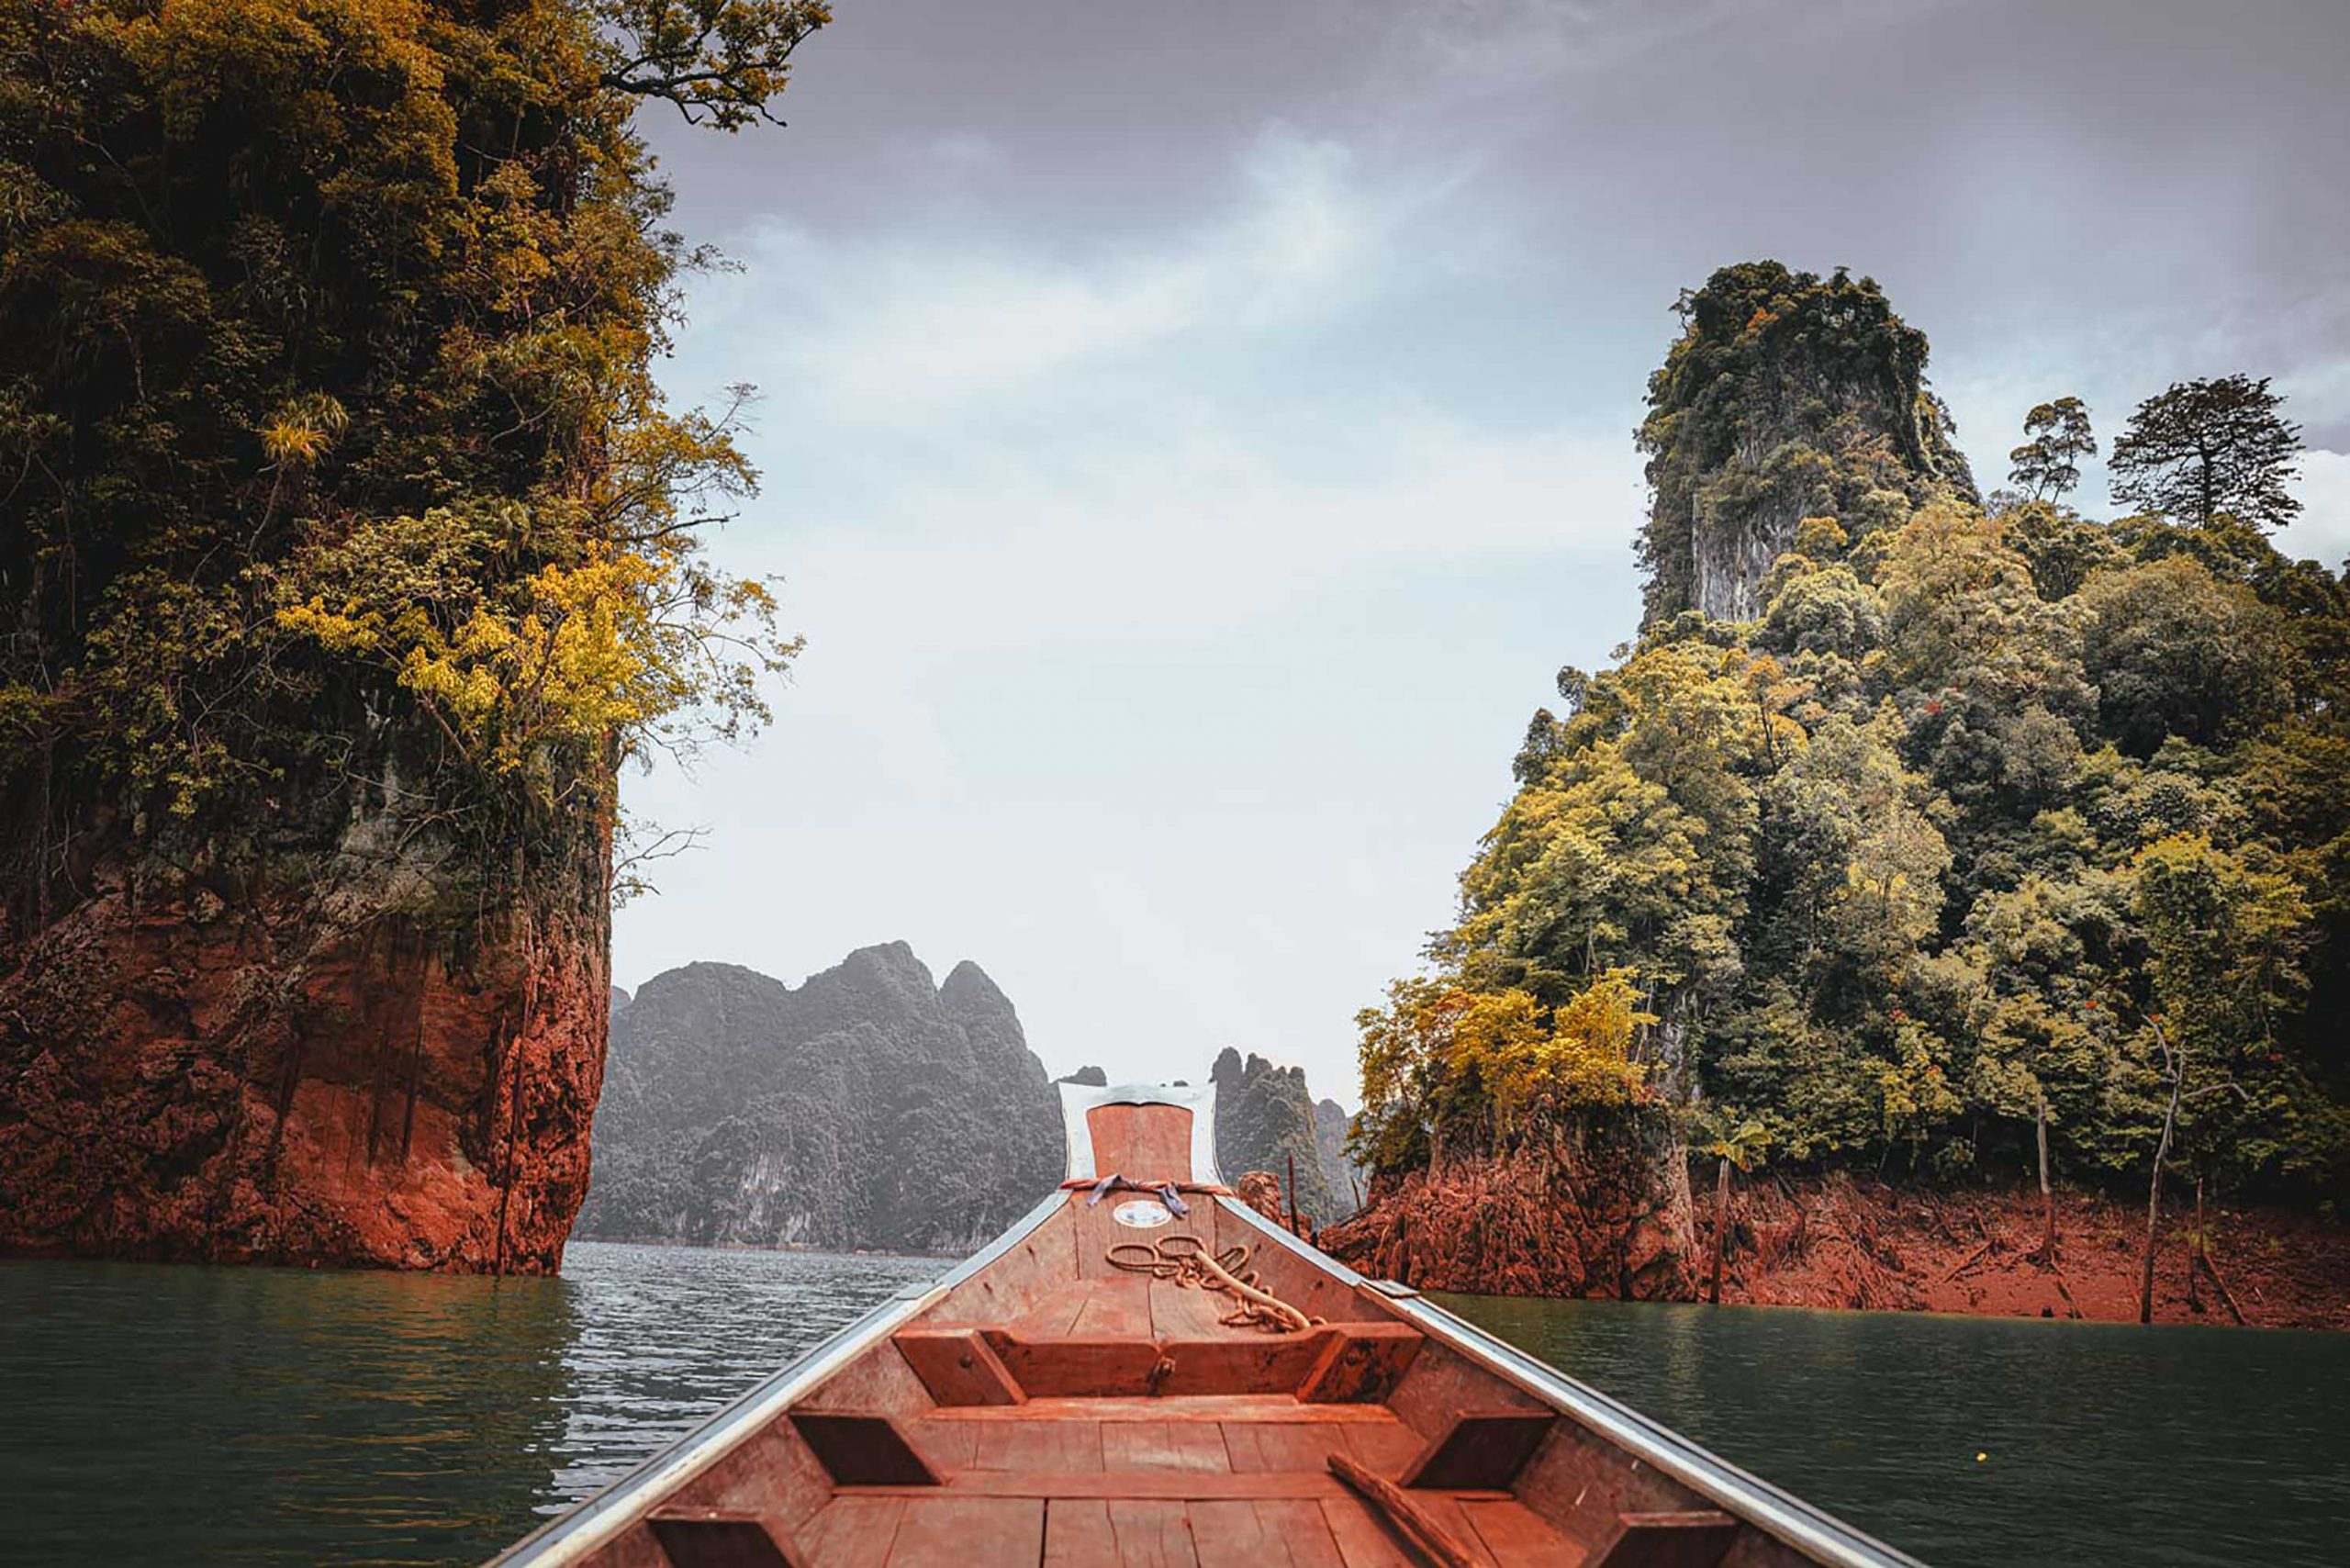 khao sok national park bezoeken thailand